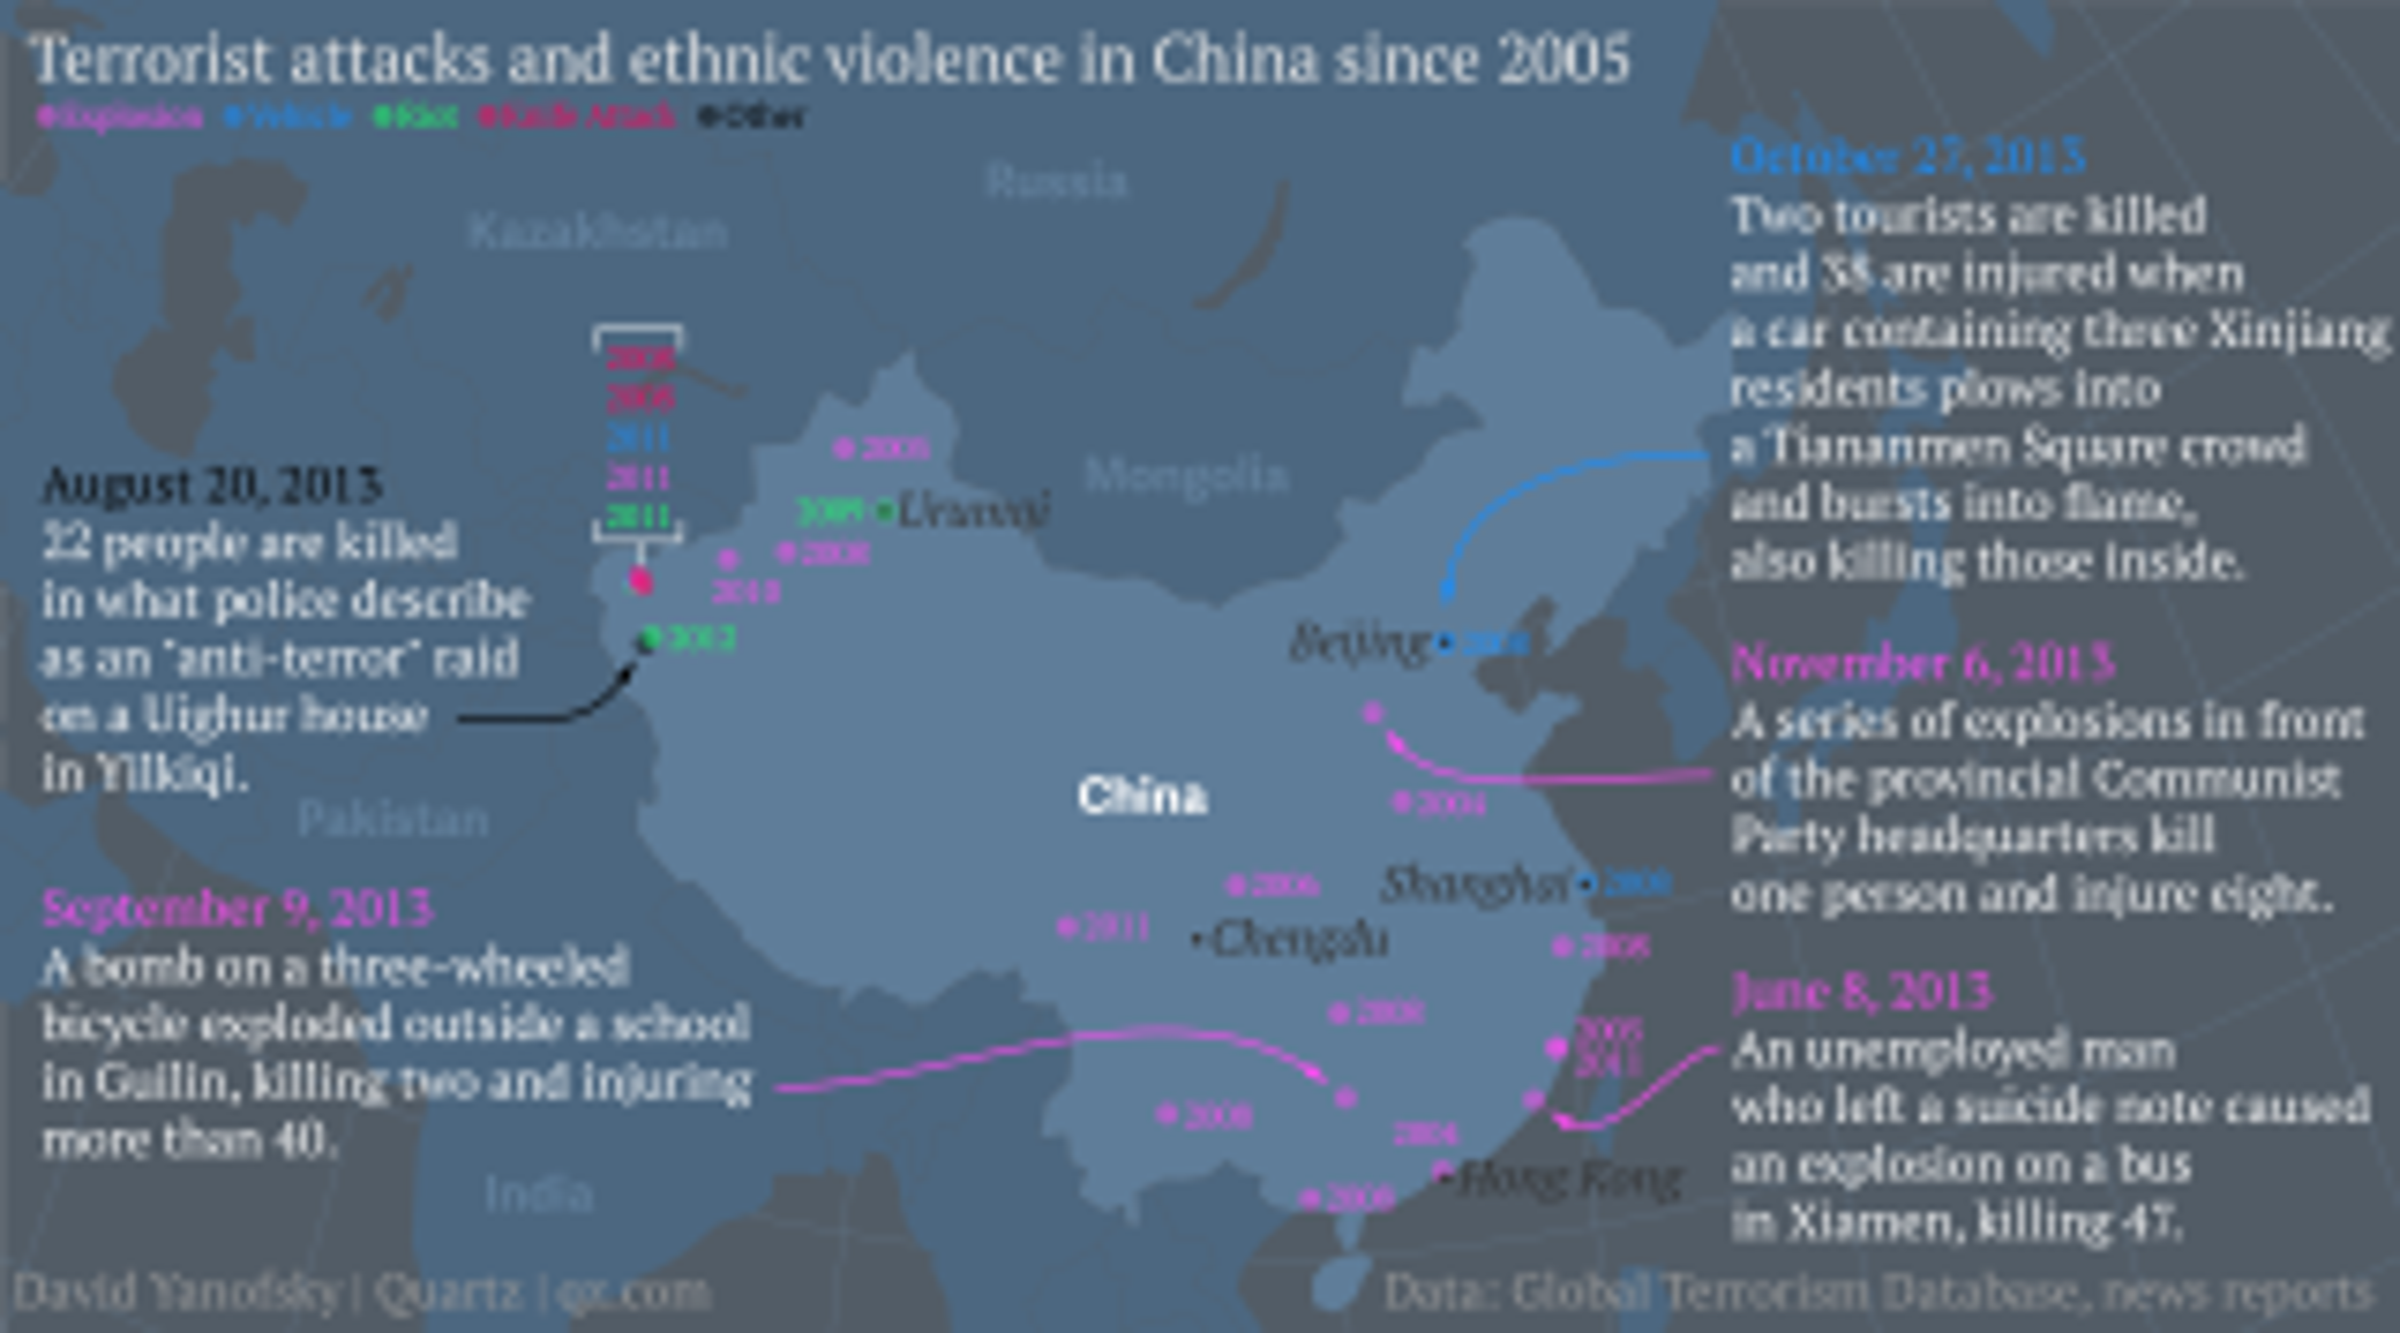 yanofsky_terrorist_attacks_and_ethnic_violence_in_CHina_since_2005